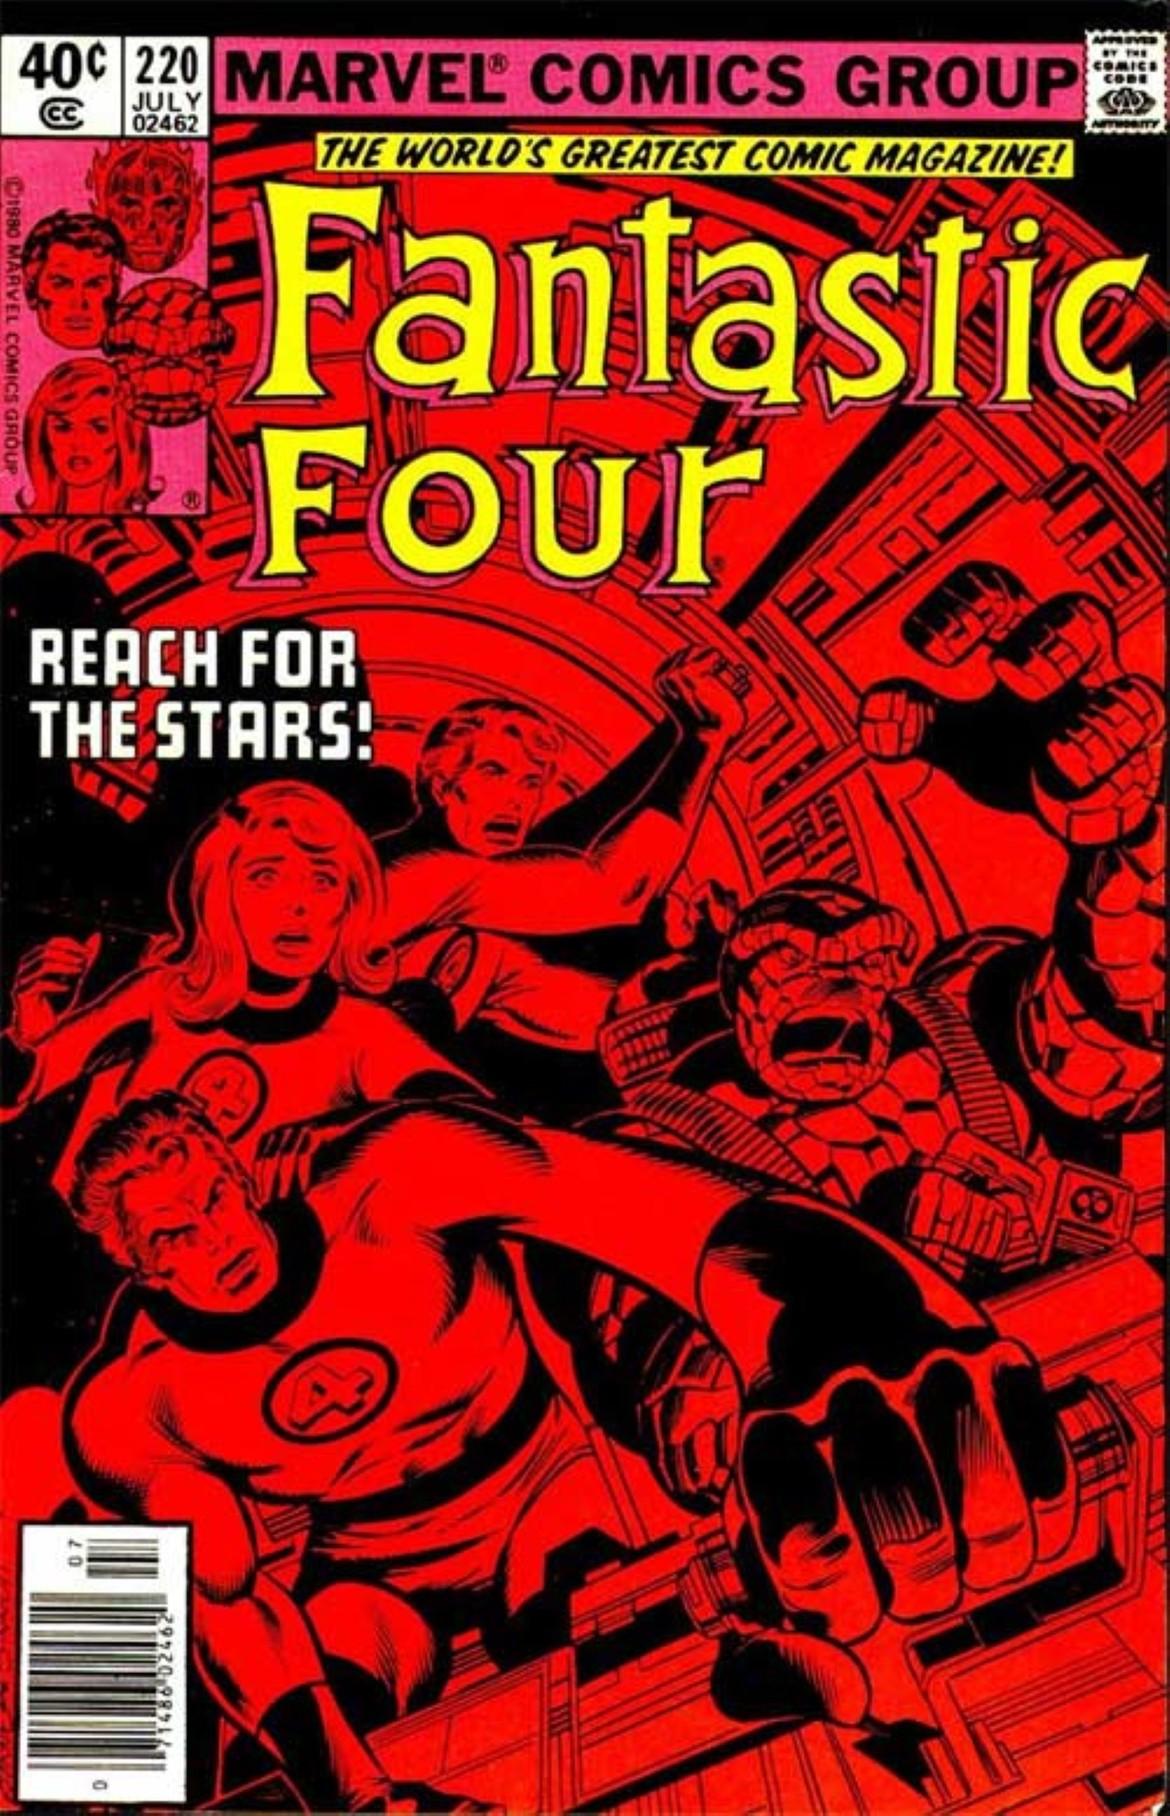 Fantastic Four 220 (Custom).jpg